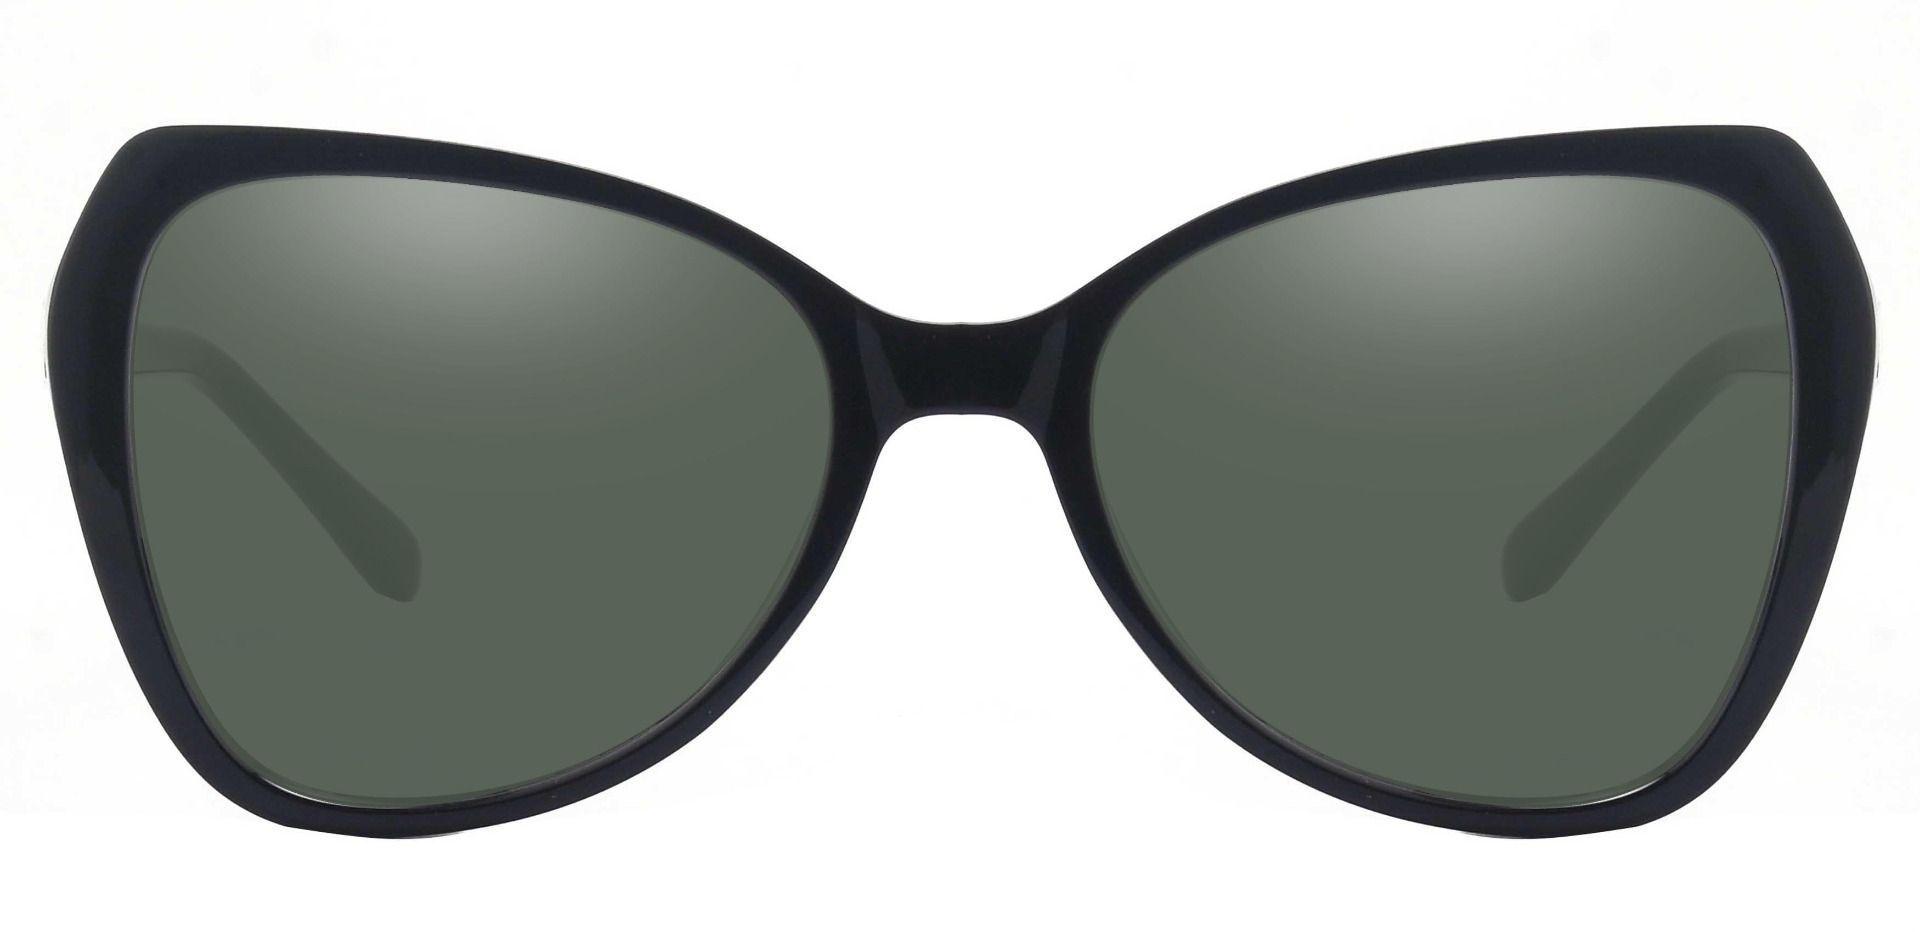 Kayla Geometric Non-Rx Sunglasses - Black Frame With Green Lenses